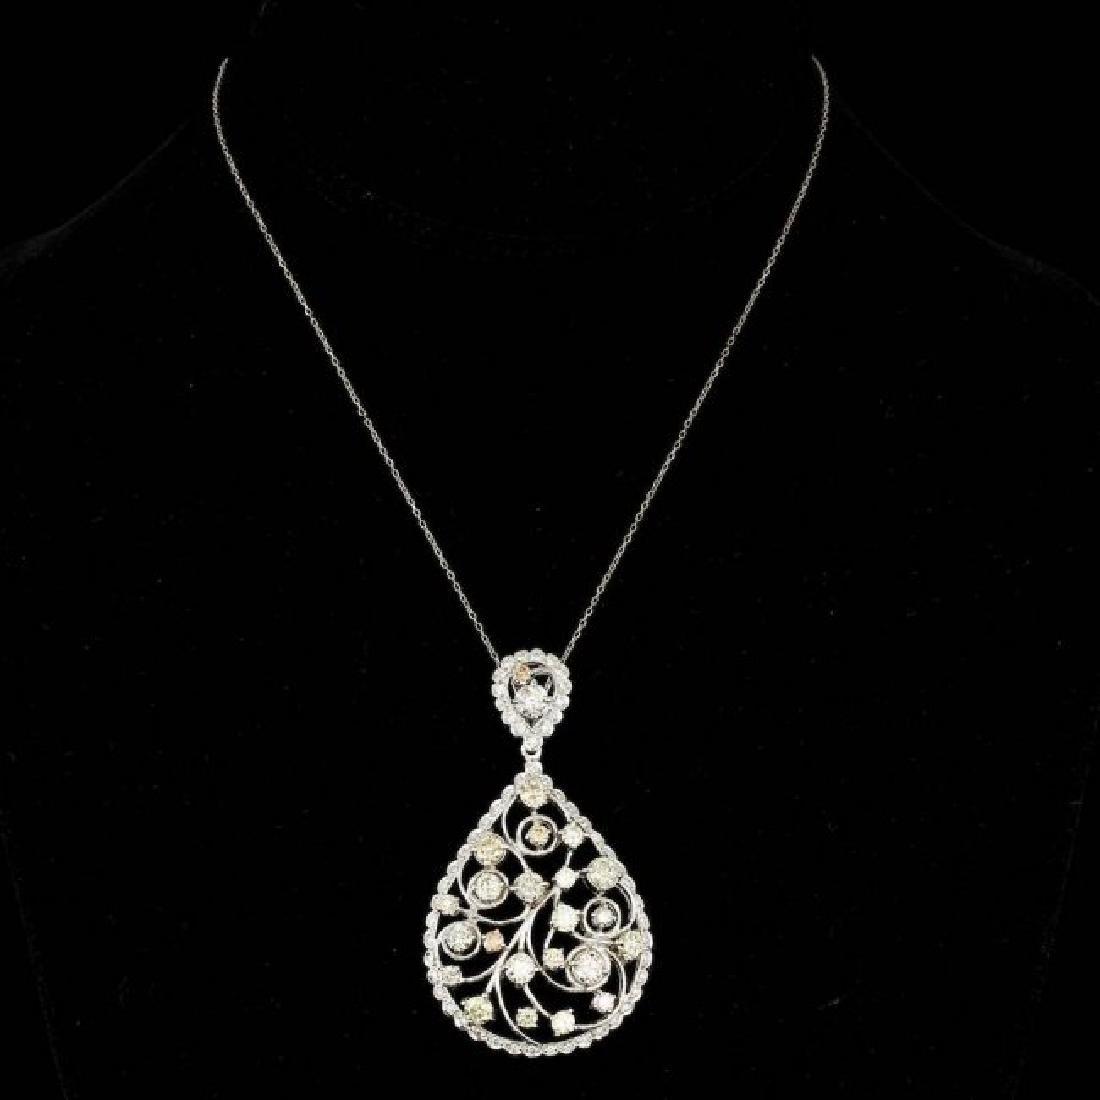 14k White Gold 6.85ct Diamond Pendant - 2